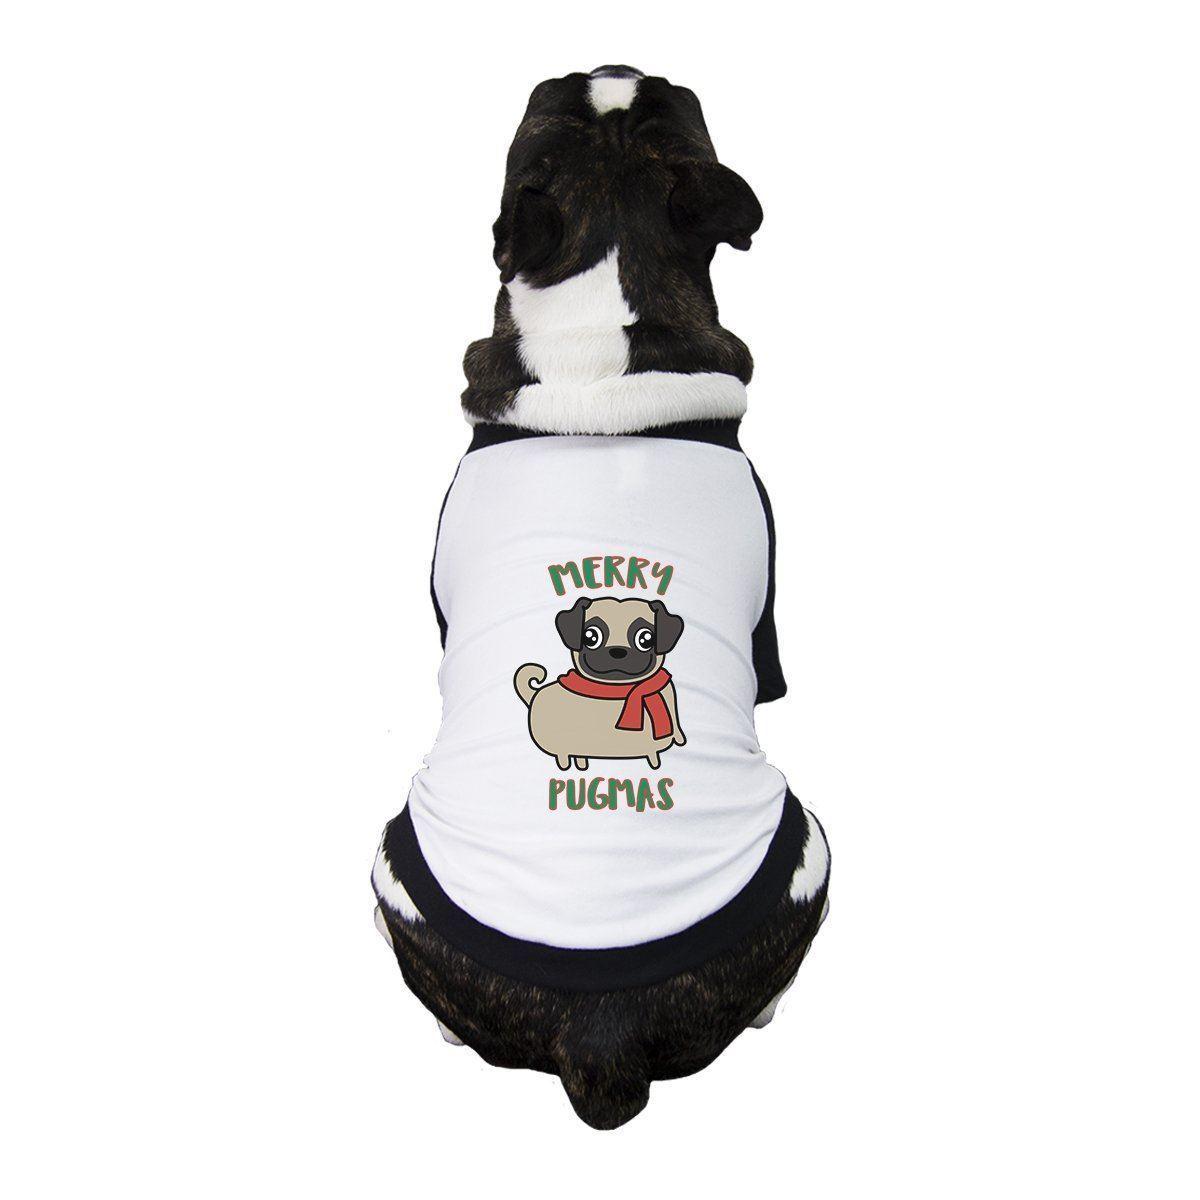 Merry Pugmas Pug Baby White Bodysuit